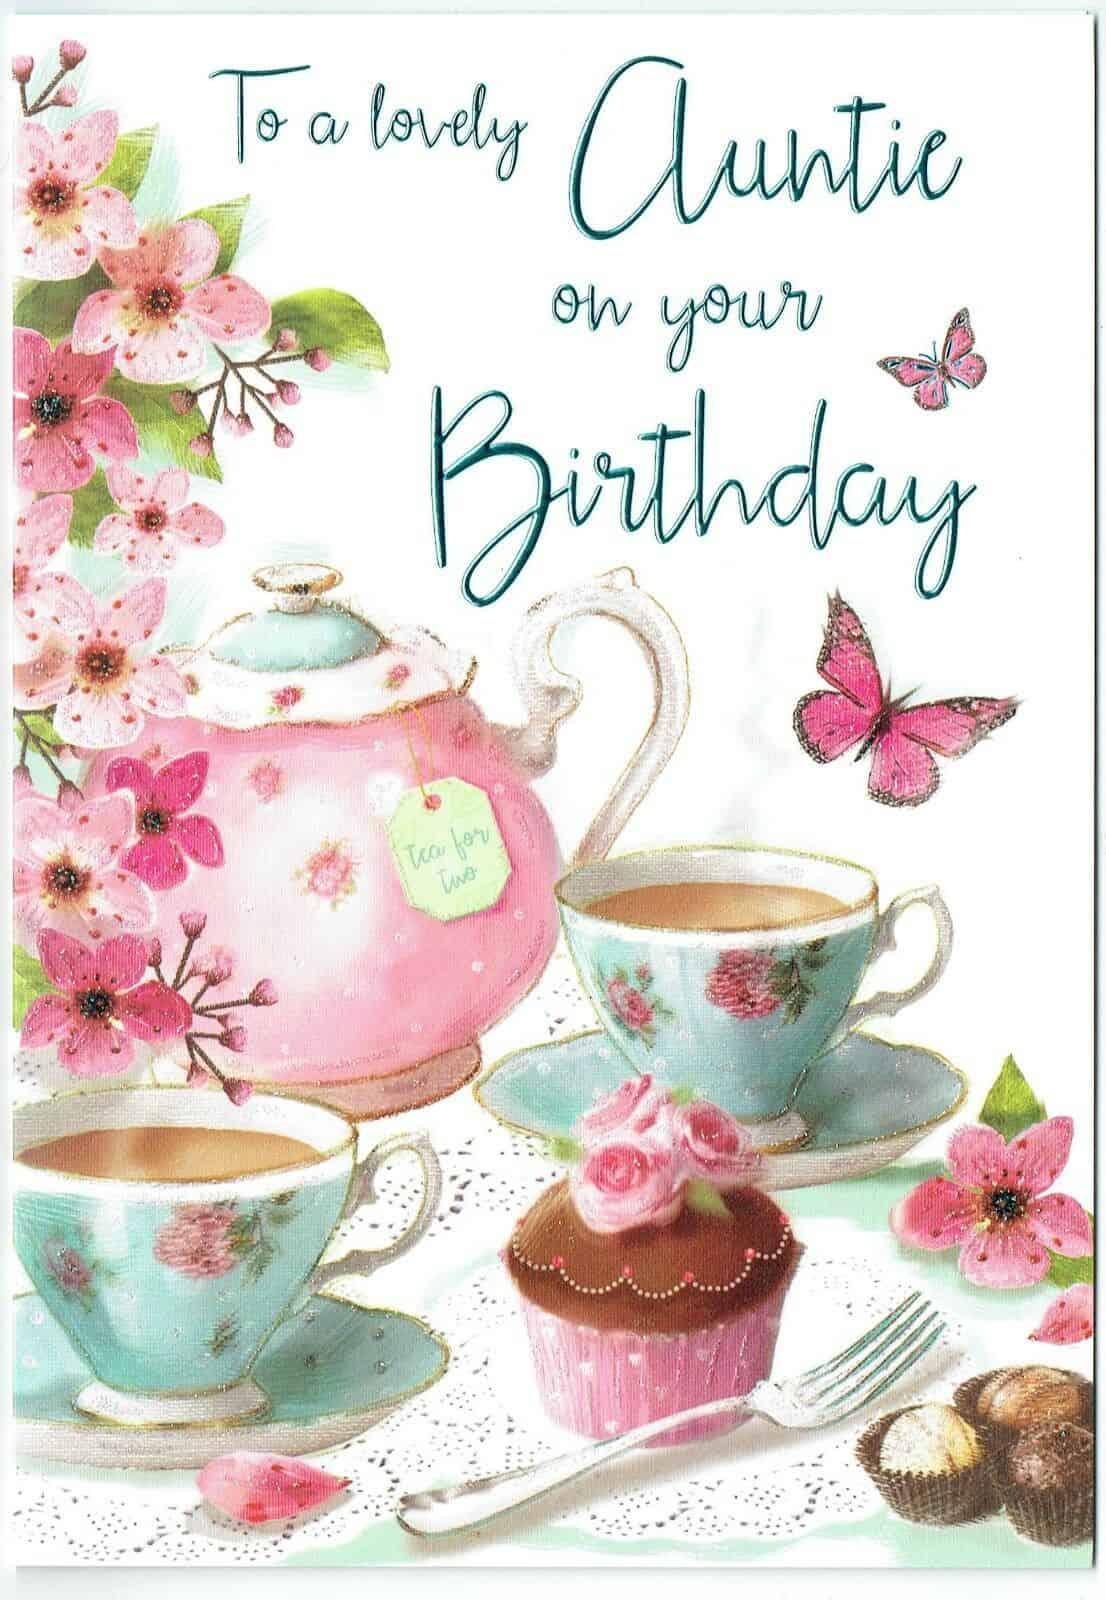 Auntie Birthday Card With Vintage Tea Set Theme